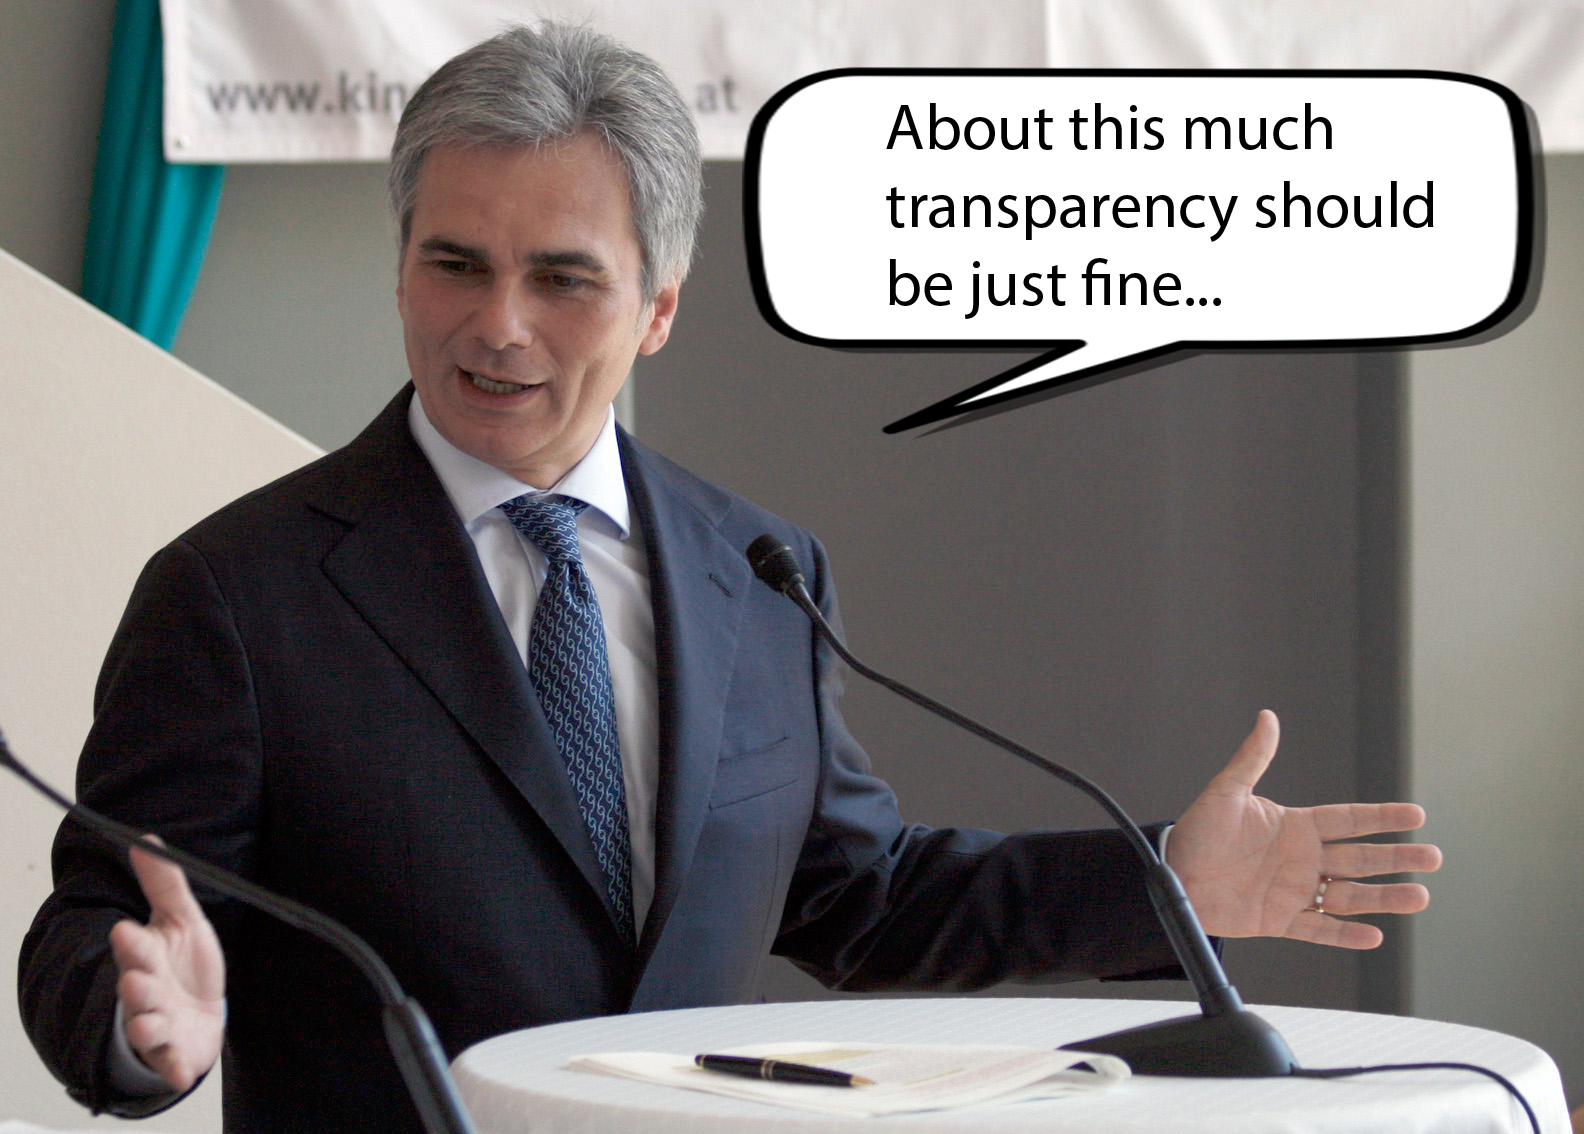 Austria: Draft FOI law falls short of international standards